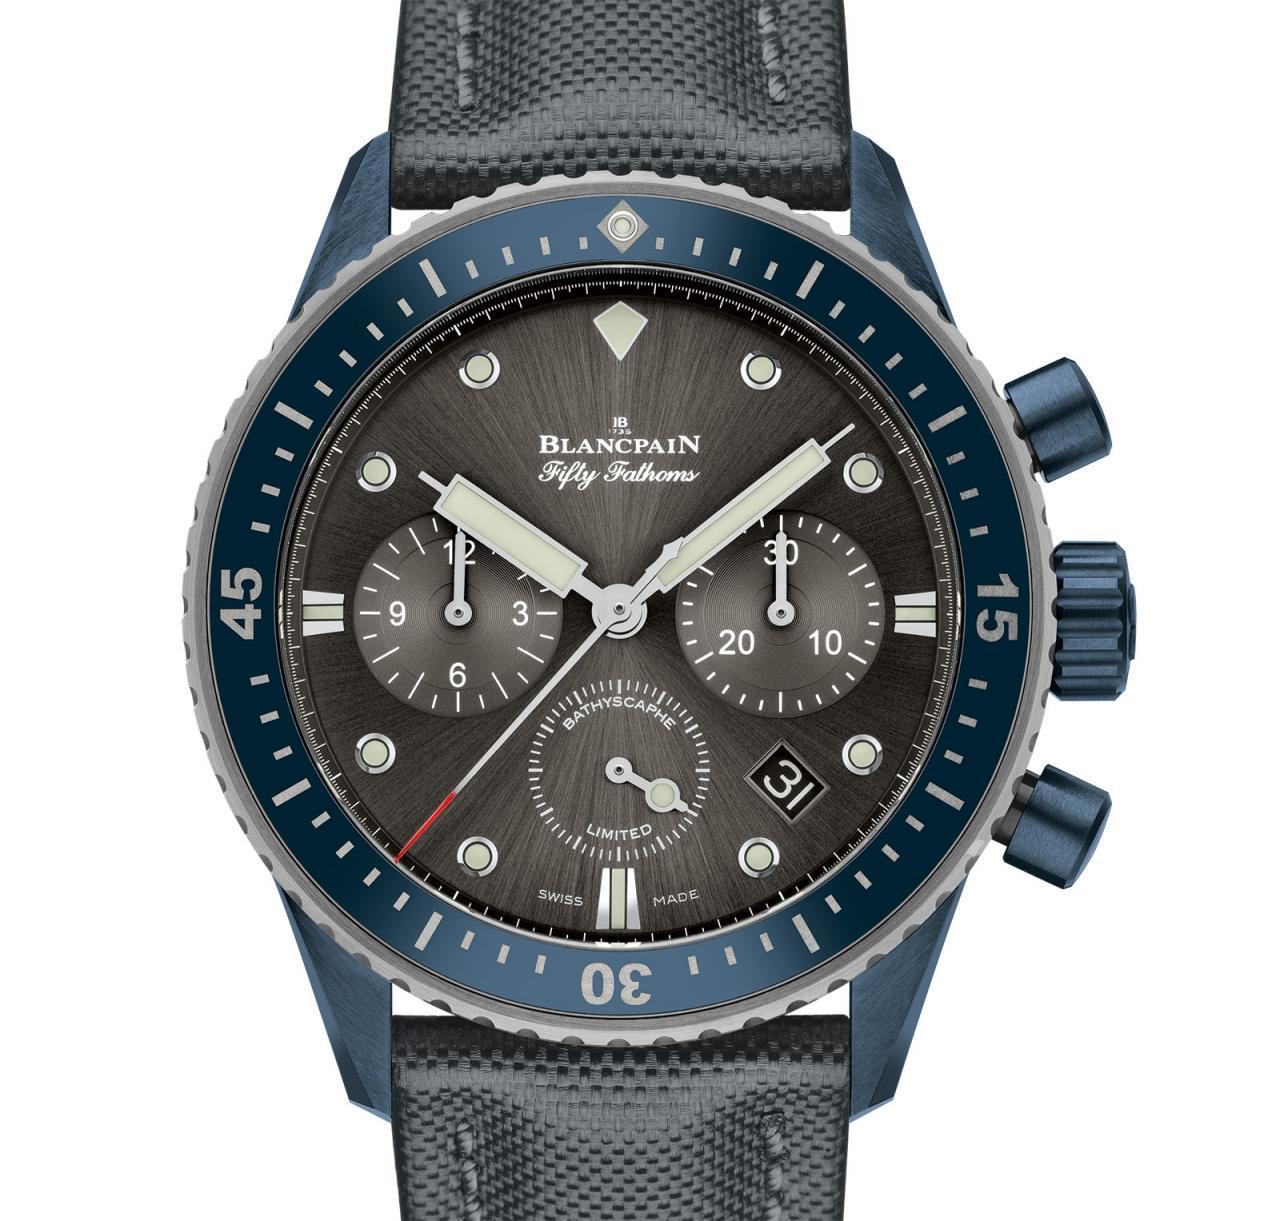 Blancpain Bathyscaphe Flyback Chronograph BOC II 2